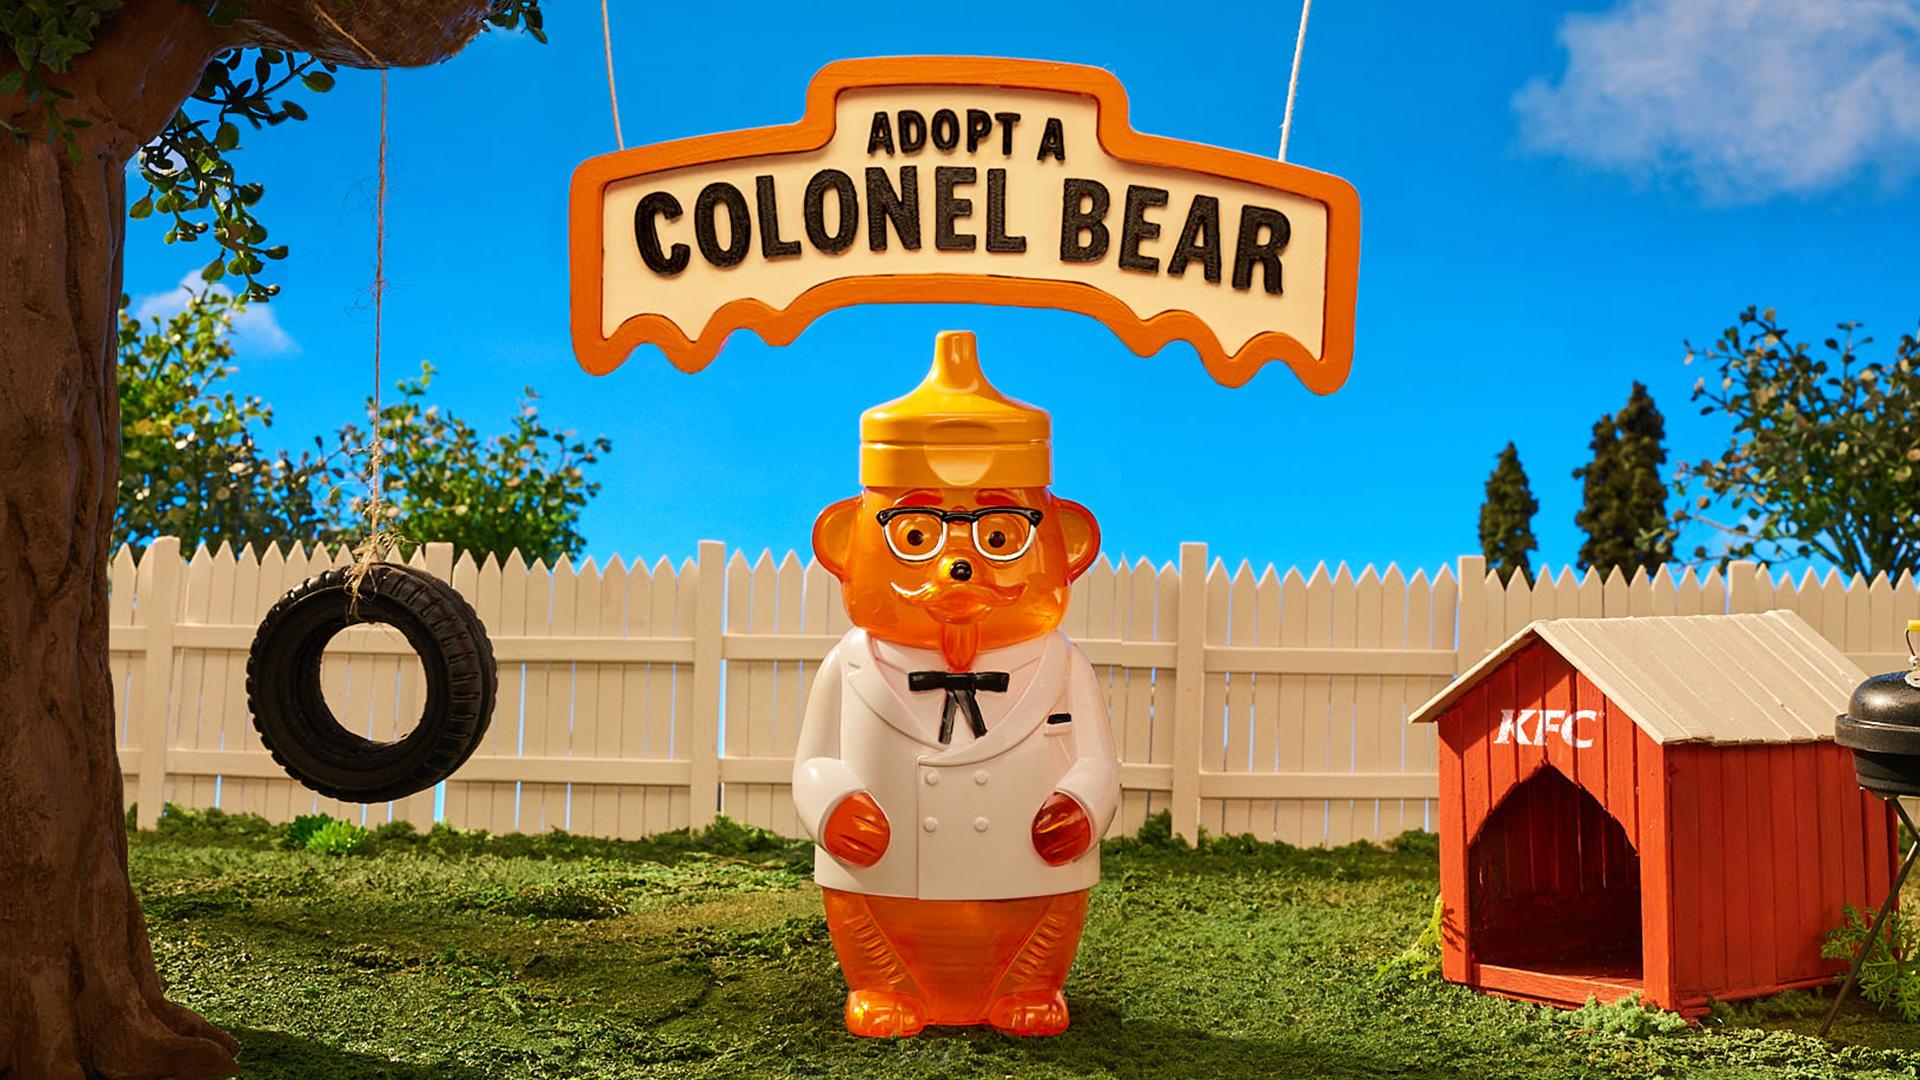 Win 1 of 705 KFC Colonel Bear Figurines worth $46 each